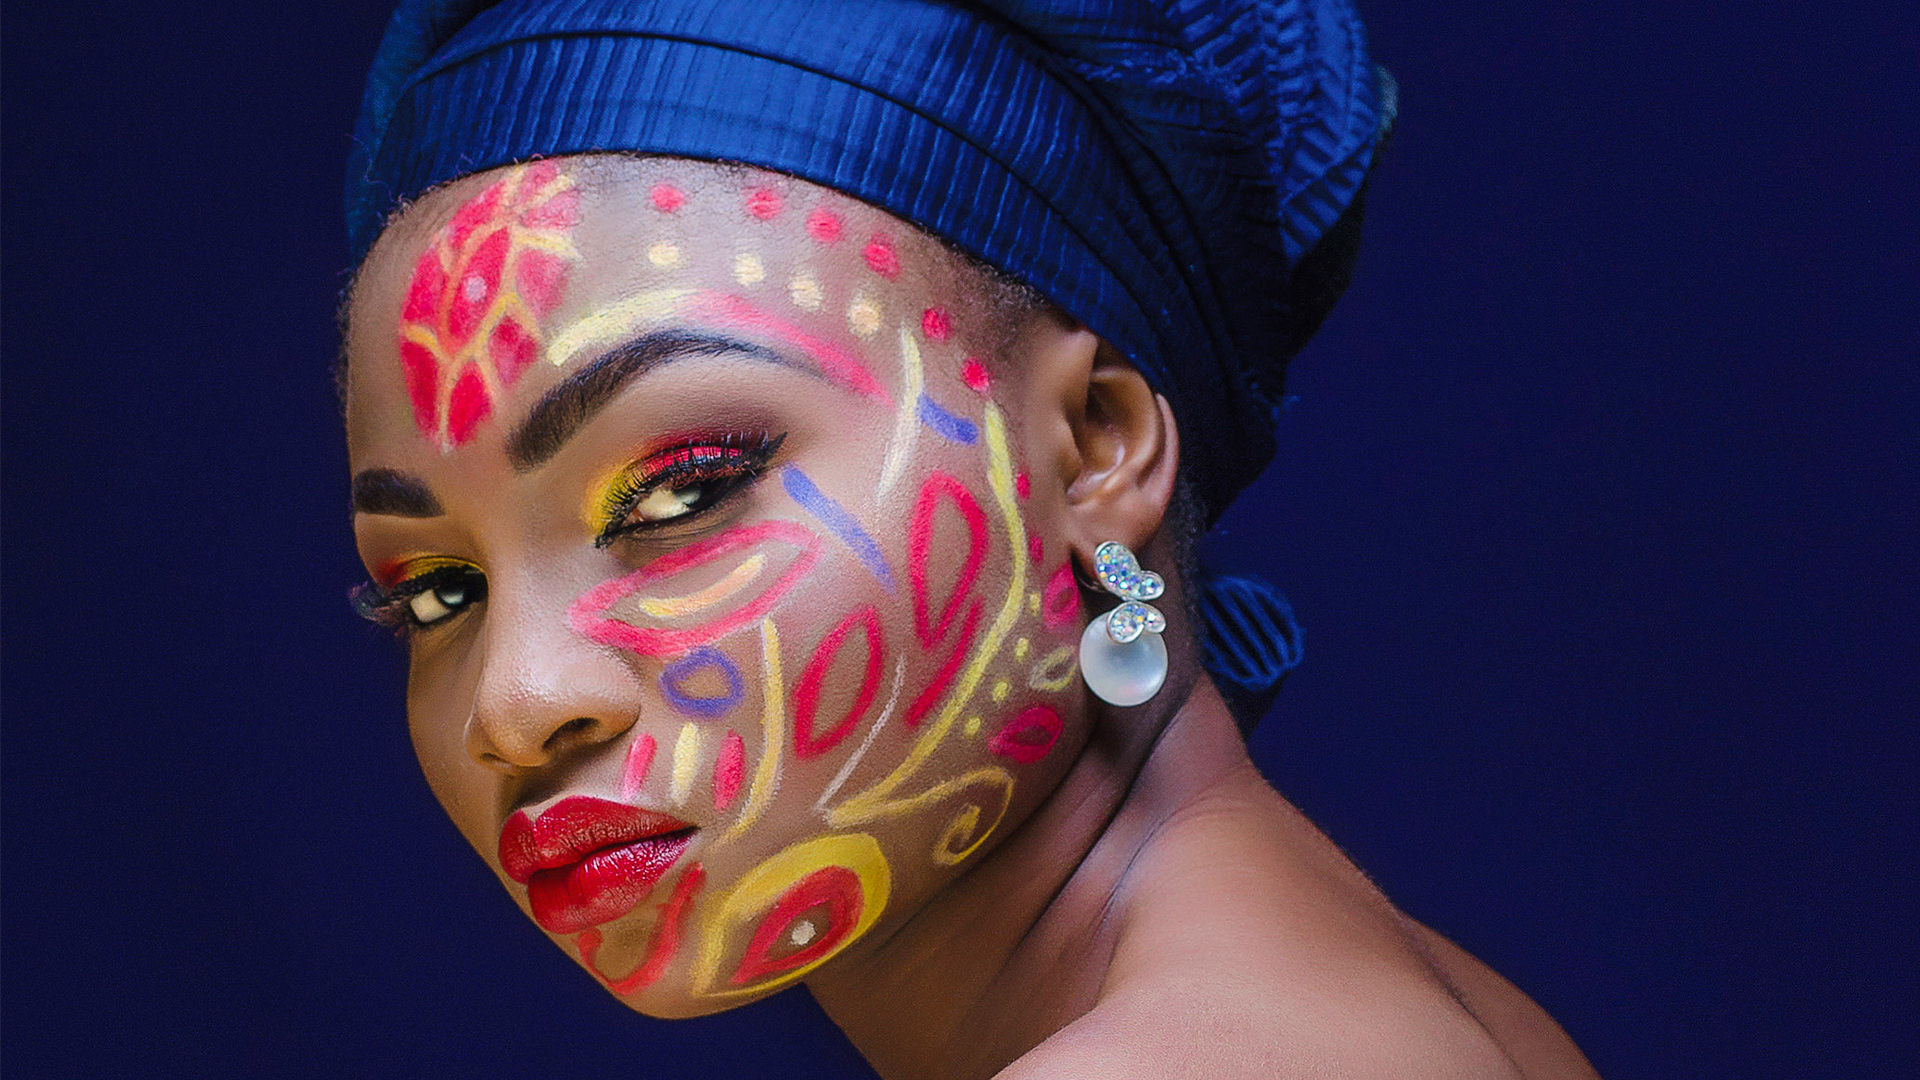 bold vibrant coloring photoshop